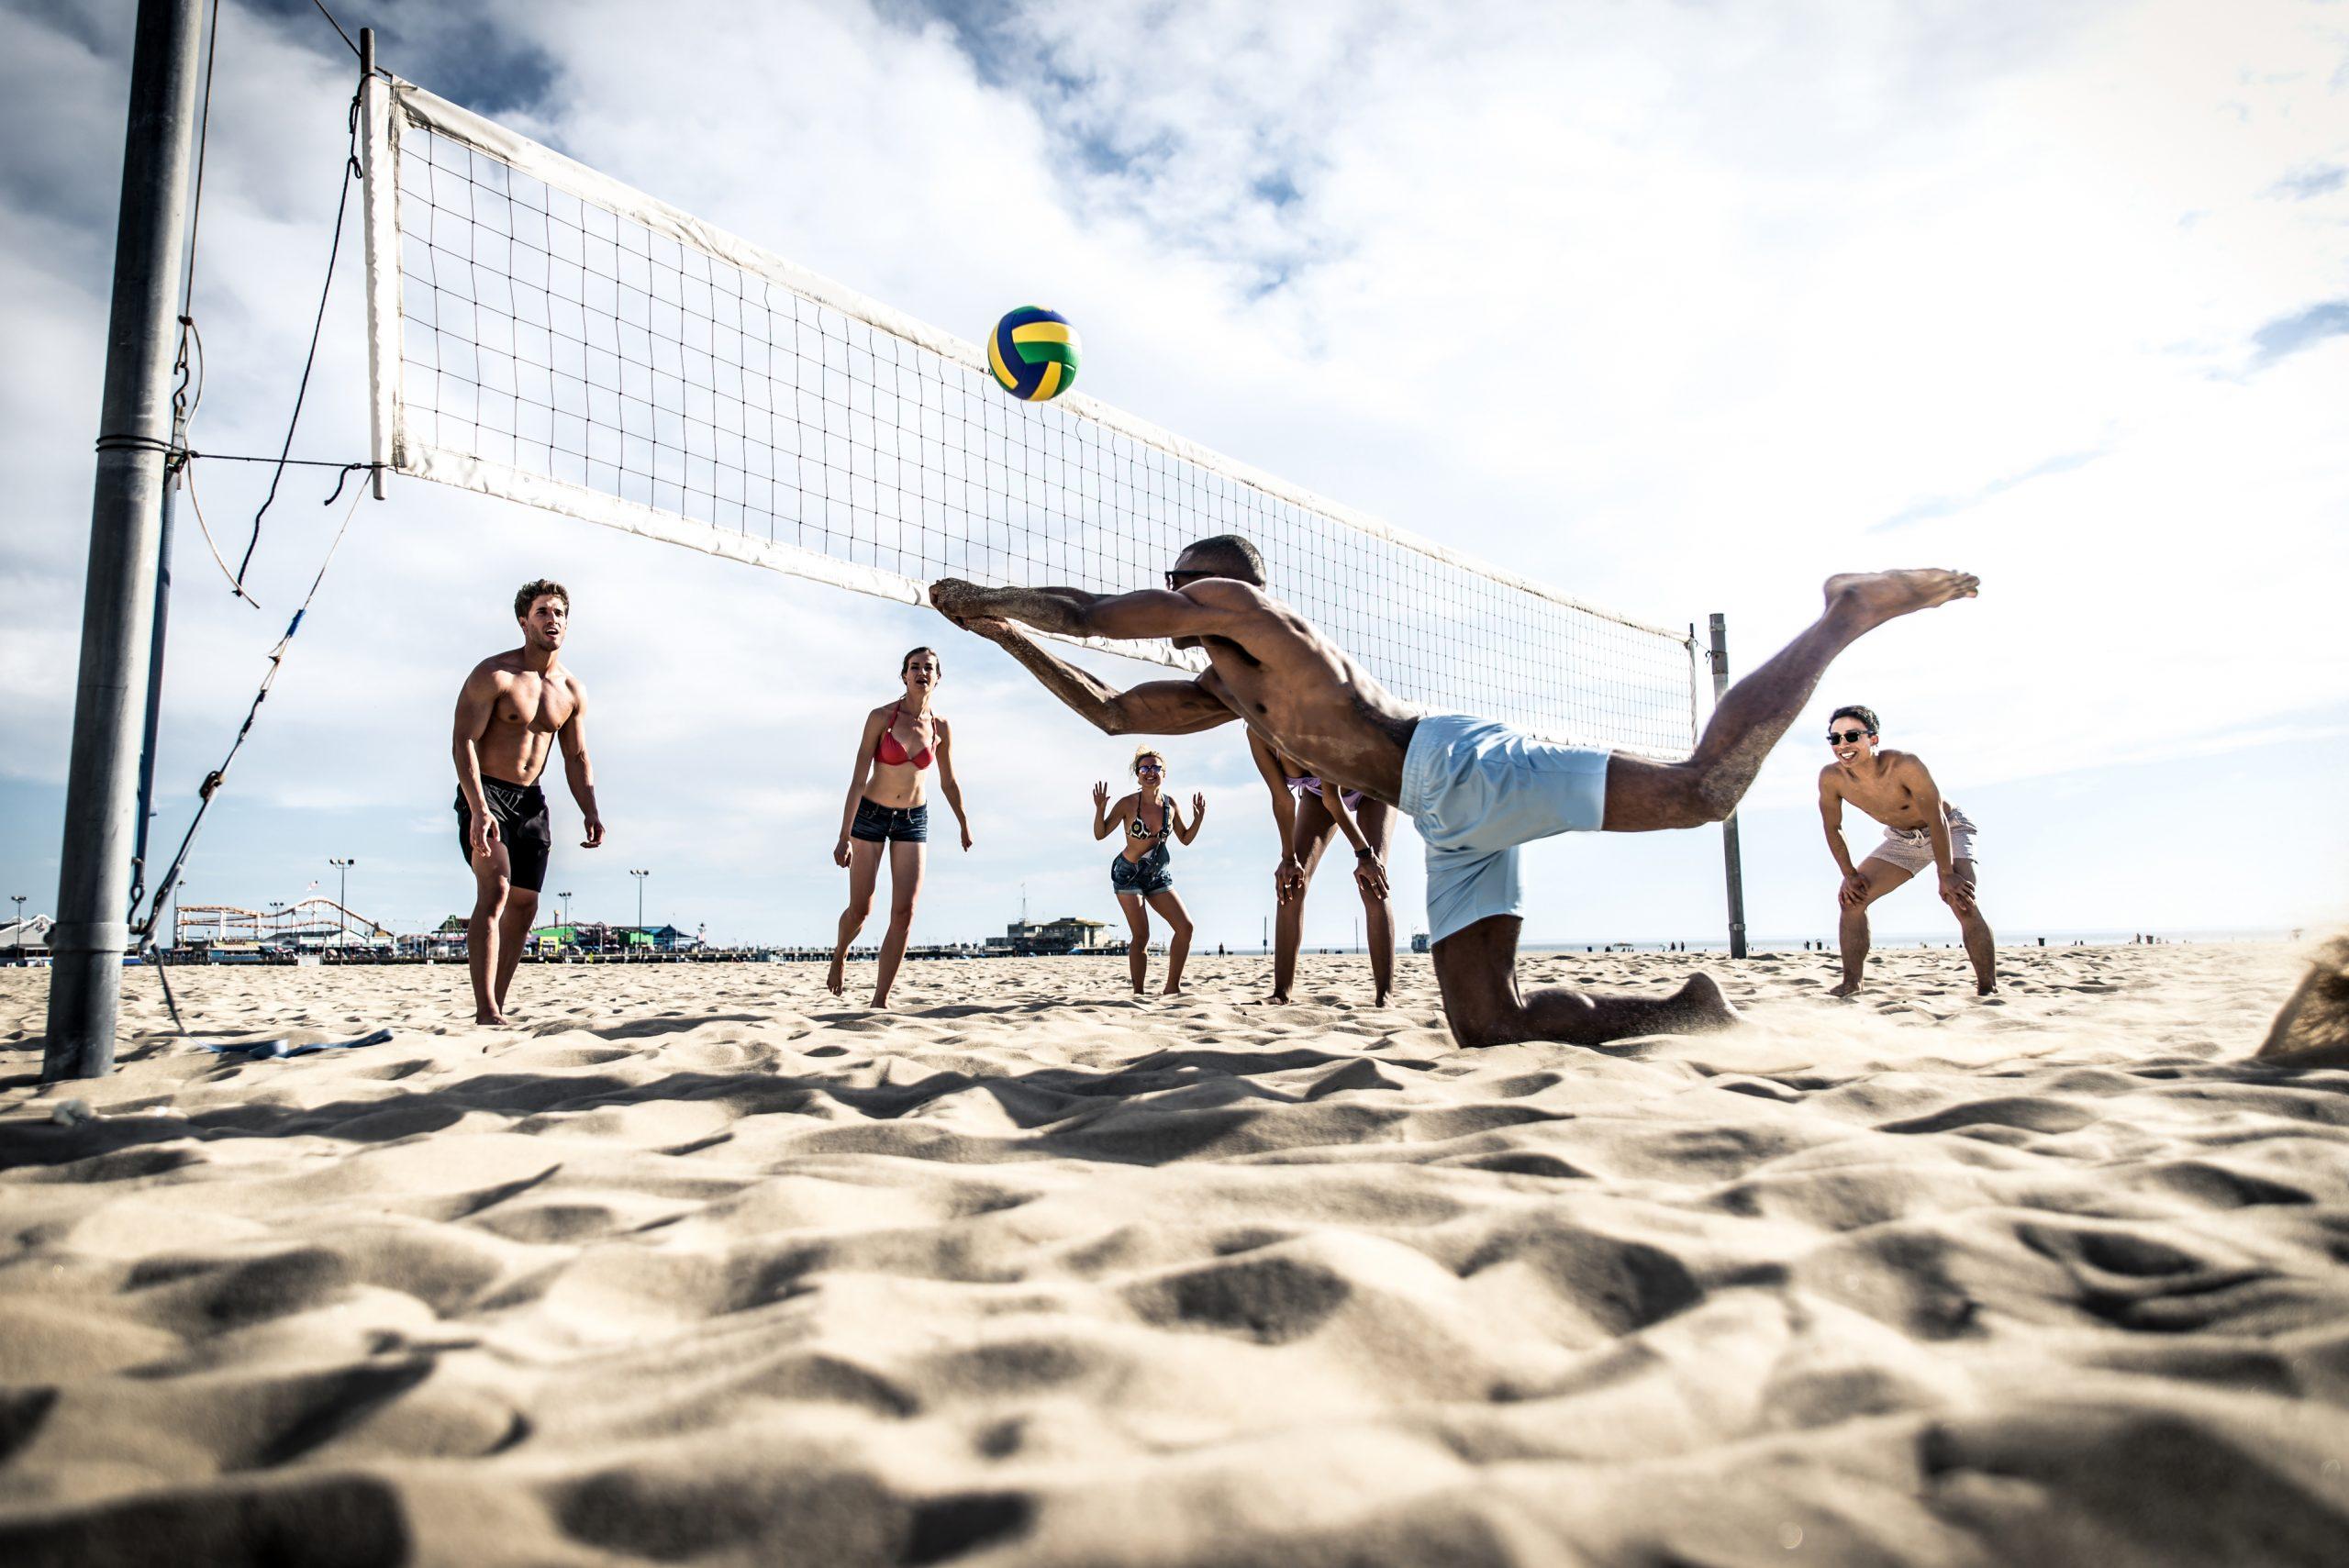 Šport Plážový volejbal